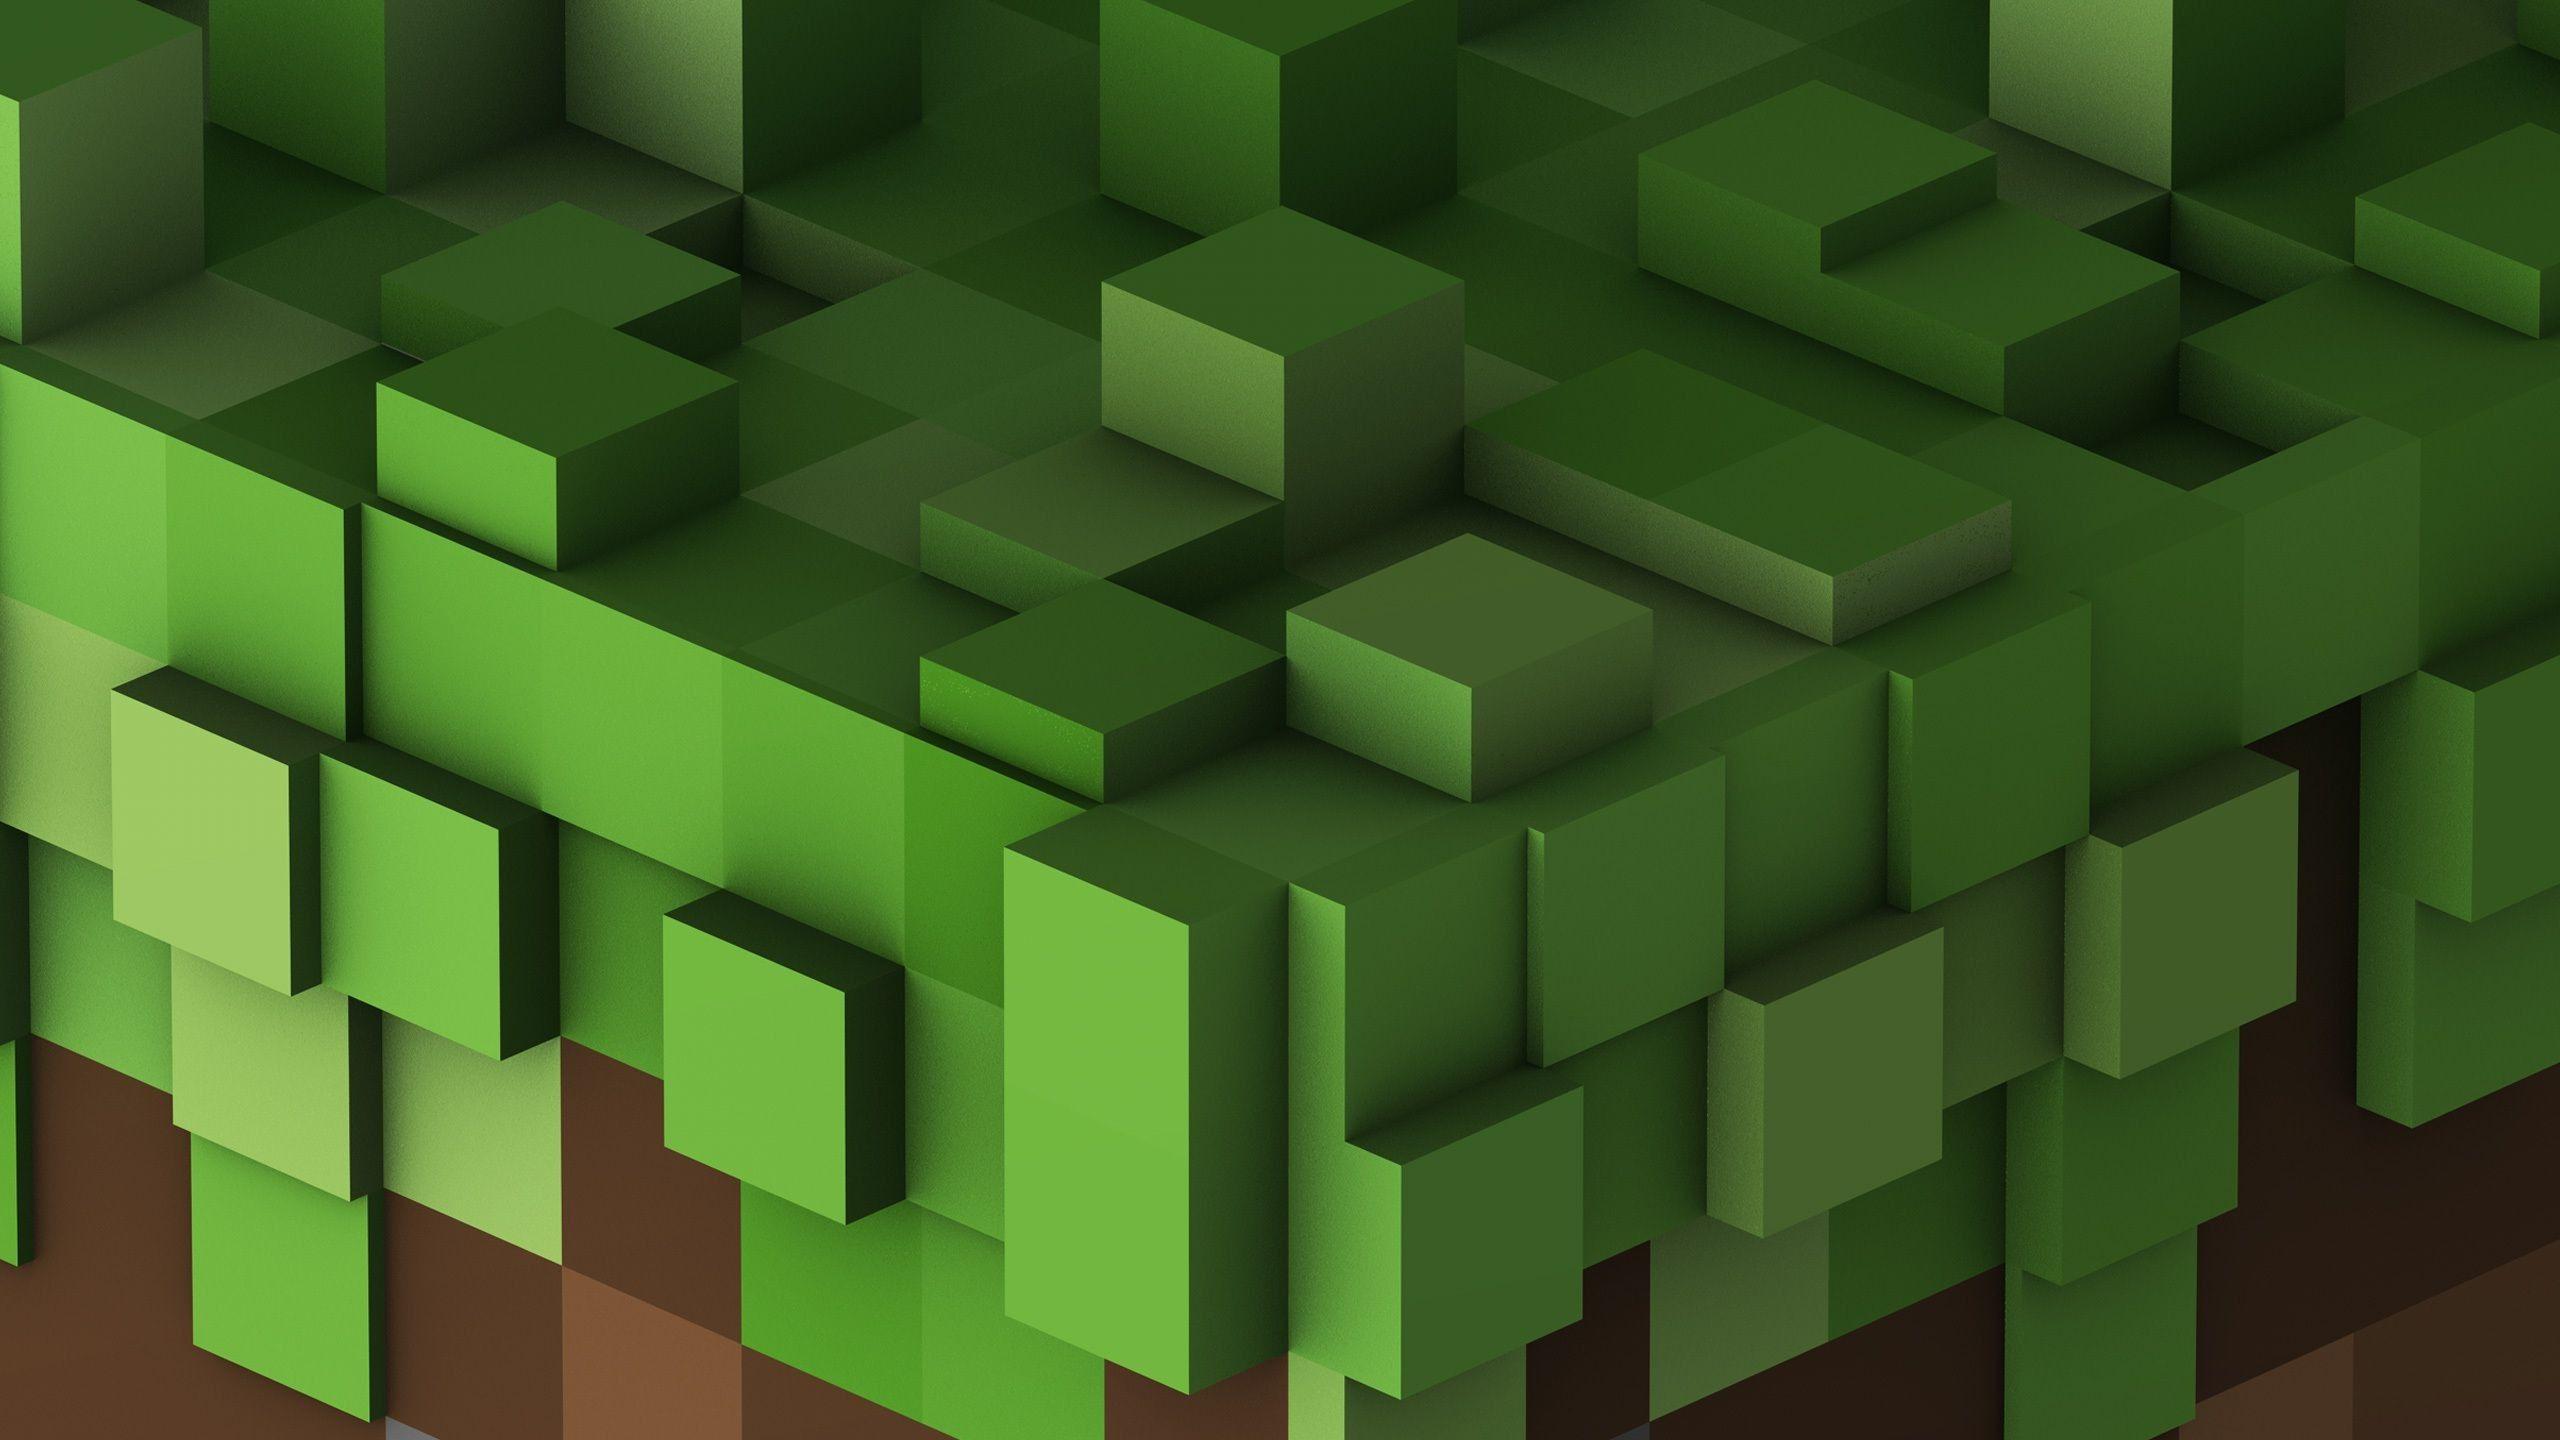 Good Wallpaper Minecraft Poster - fb65f1c636d3fd66c67f27b408f47e6e  Gallery_949164.jpg